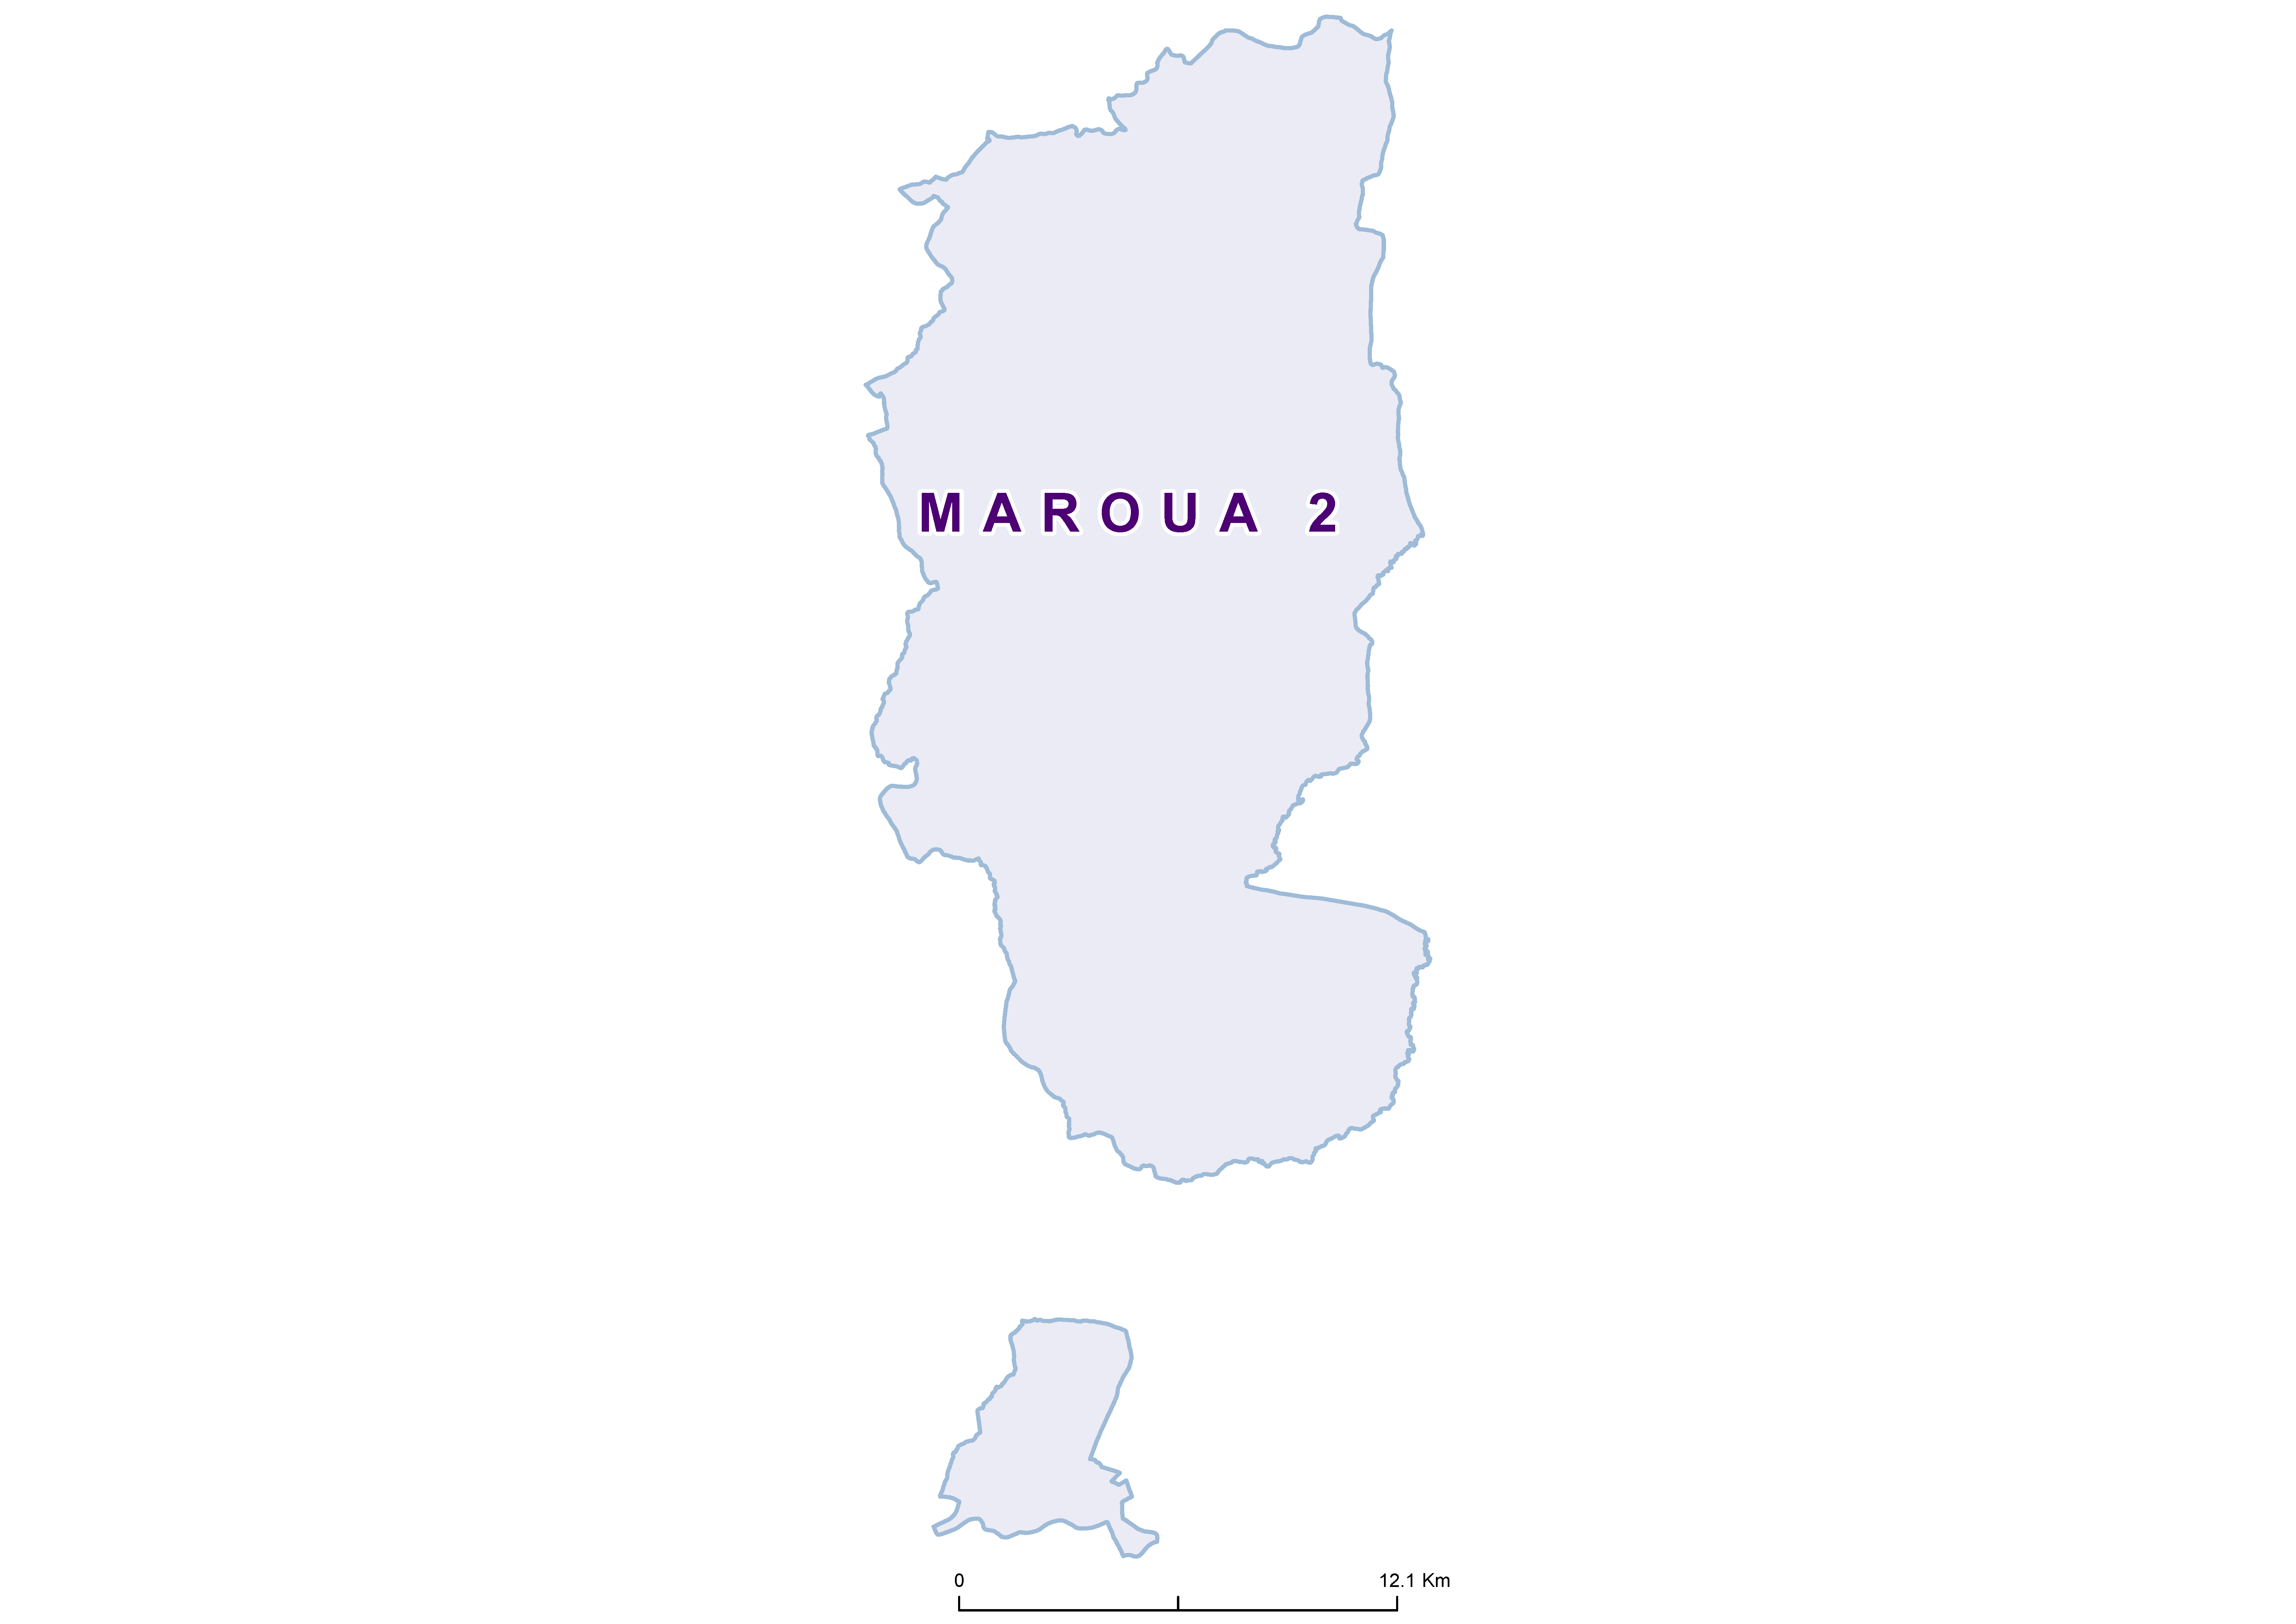 Maroua 2 Mean SCH 19850001